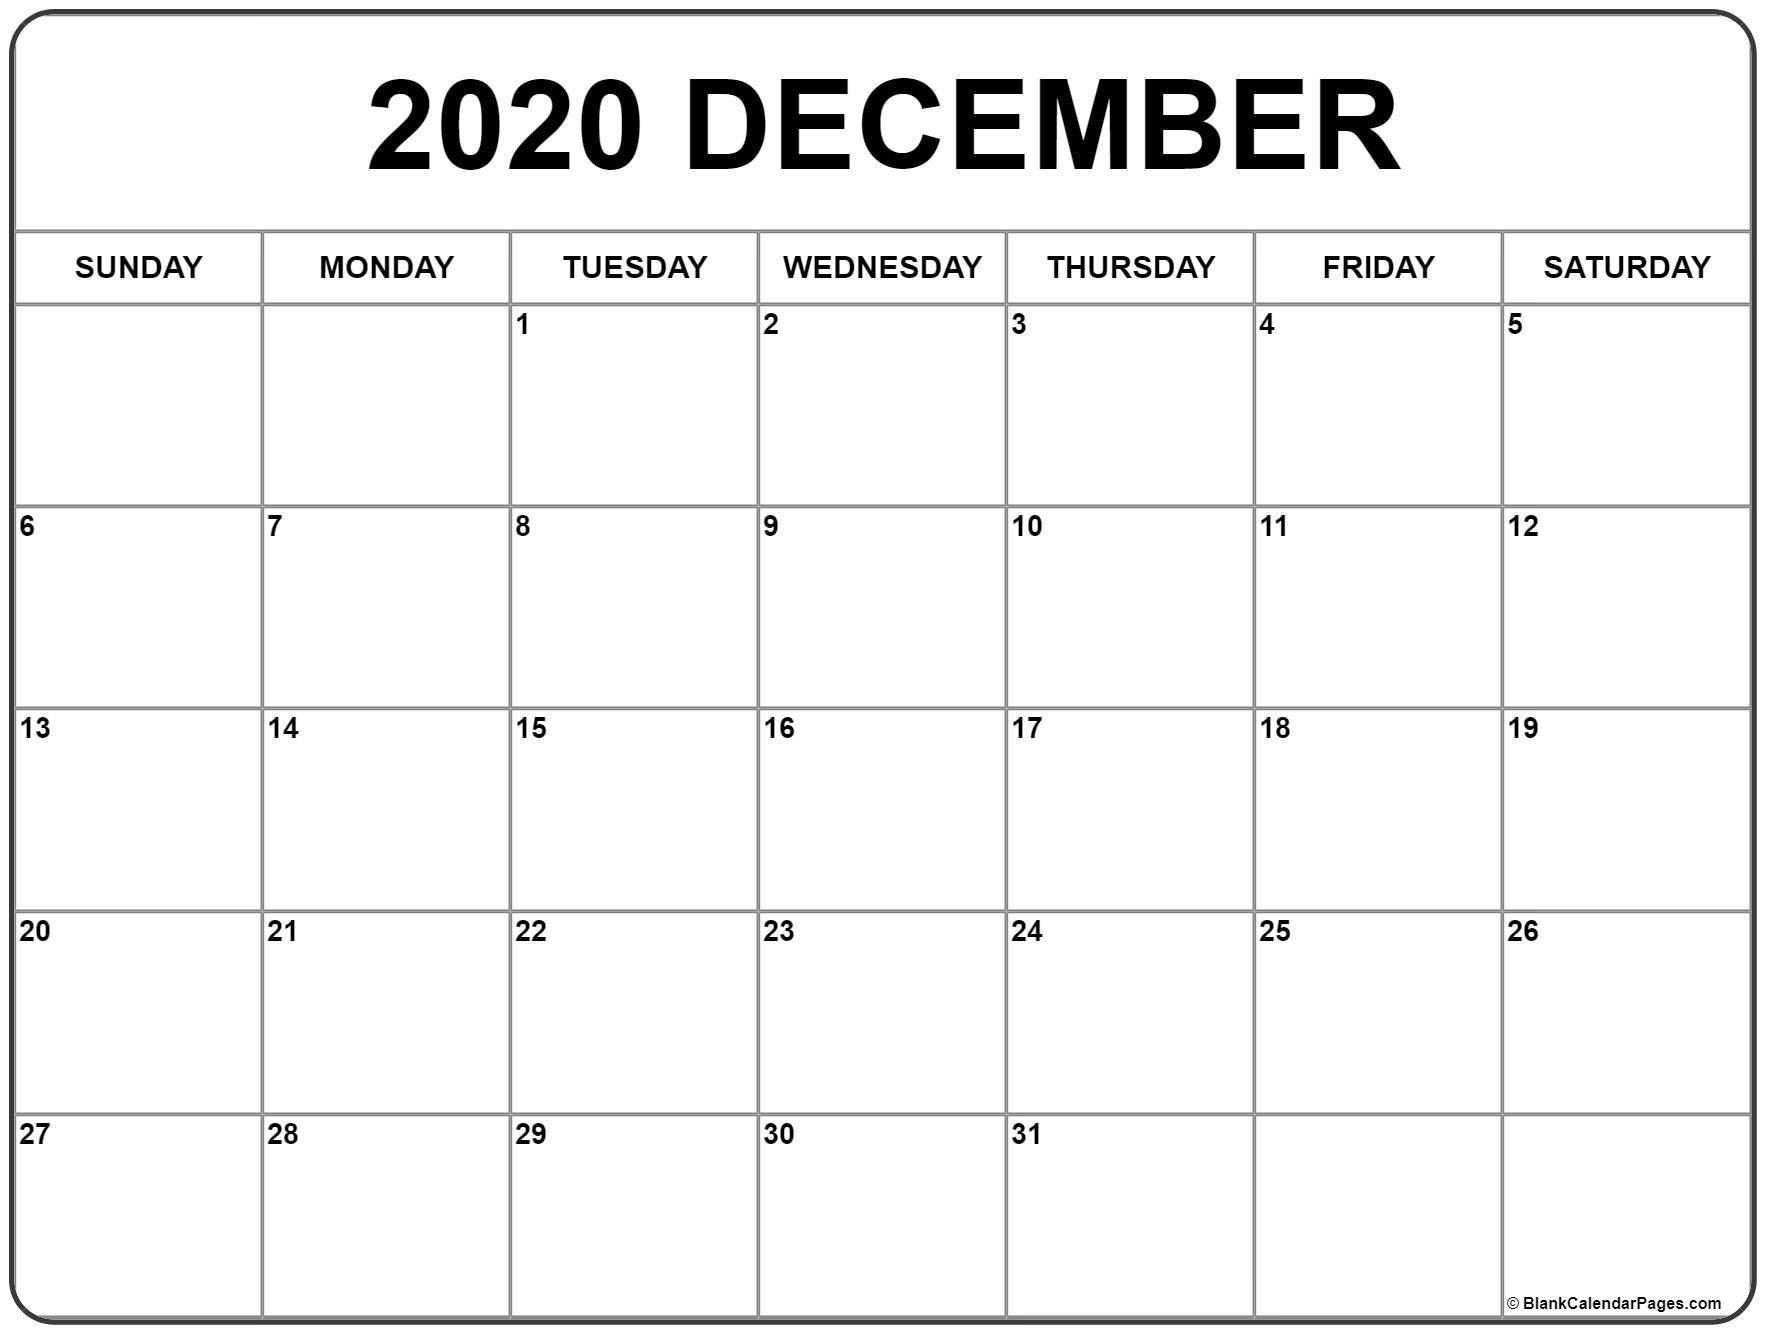 Blank Fill In Calendars 2021 Printable   Calendar Template throughout Fill In Calendar 2021